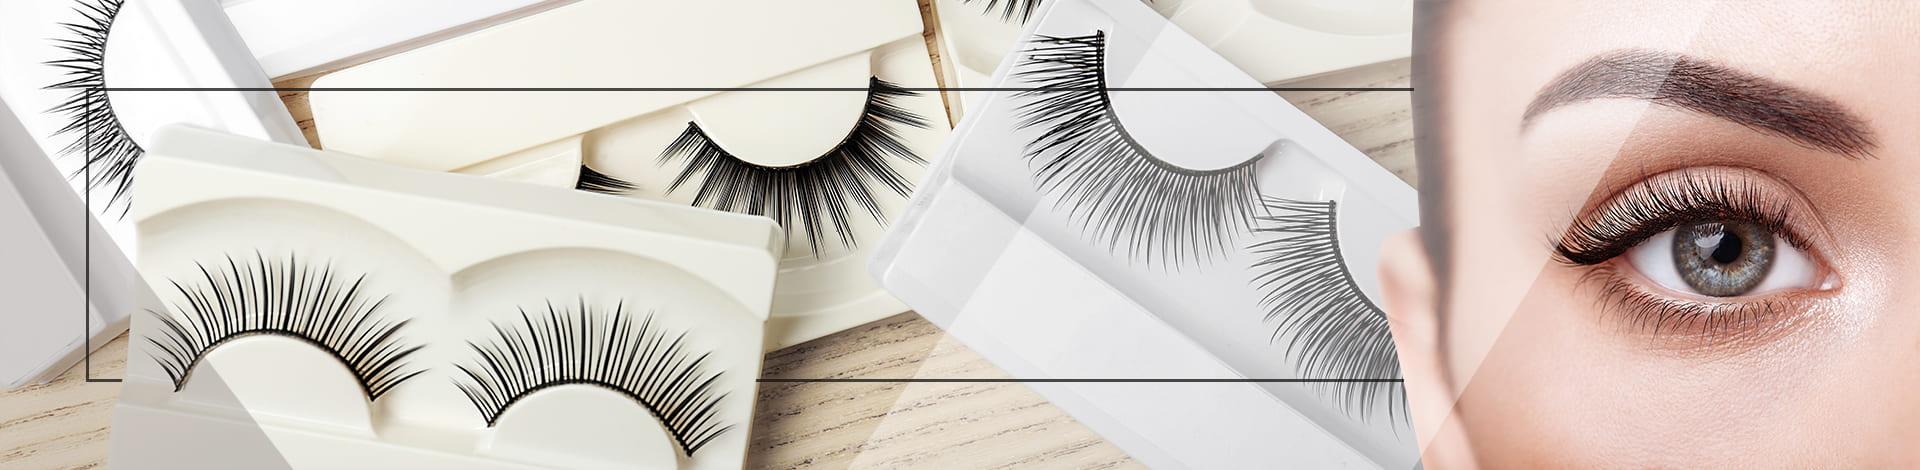 10 best fake eyelashes 2019 banner